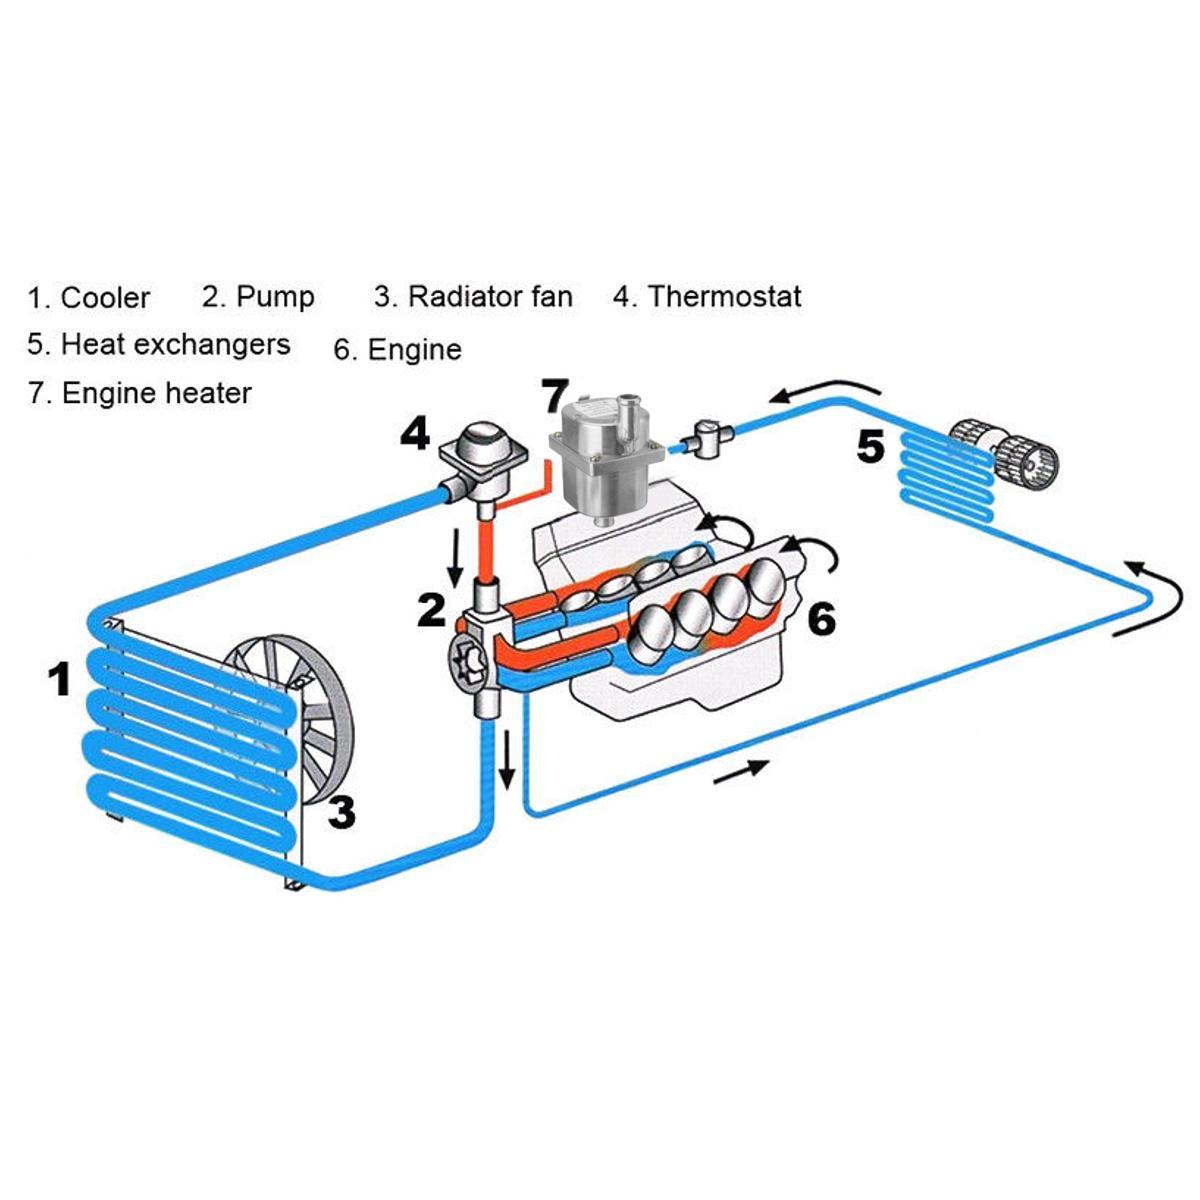 medium resolution of 3000w car engine coolant heater preheater not w ebasto eberspacher motor heating preheating air parking heater in heating fans from automobiles